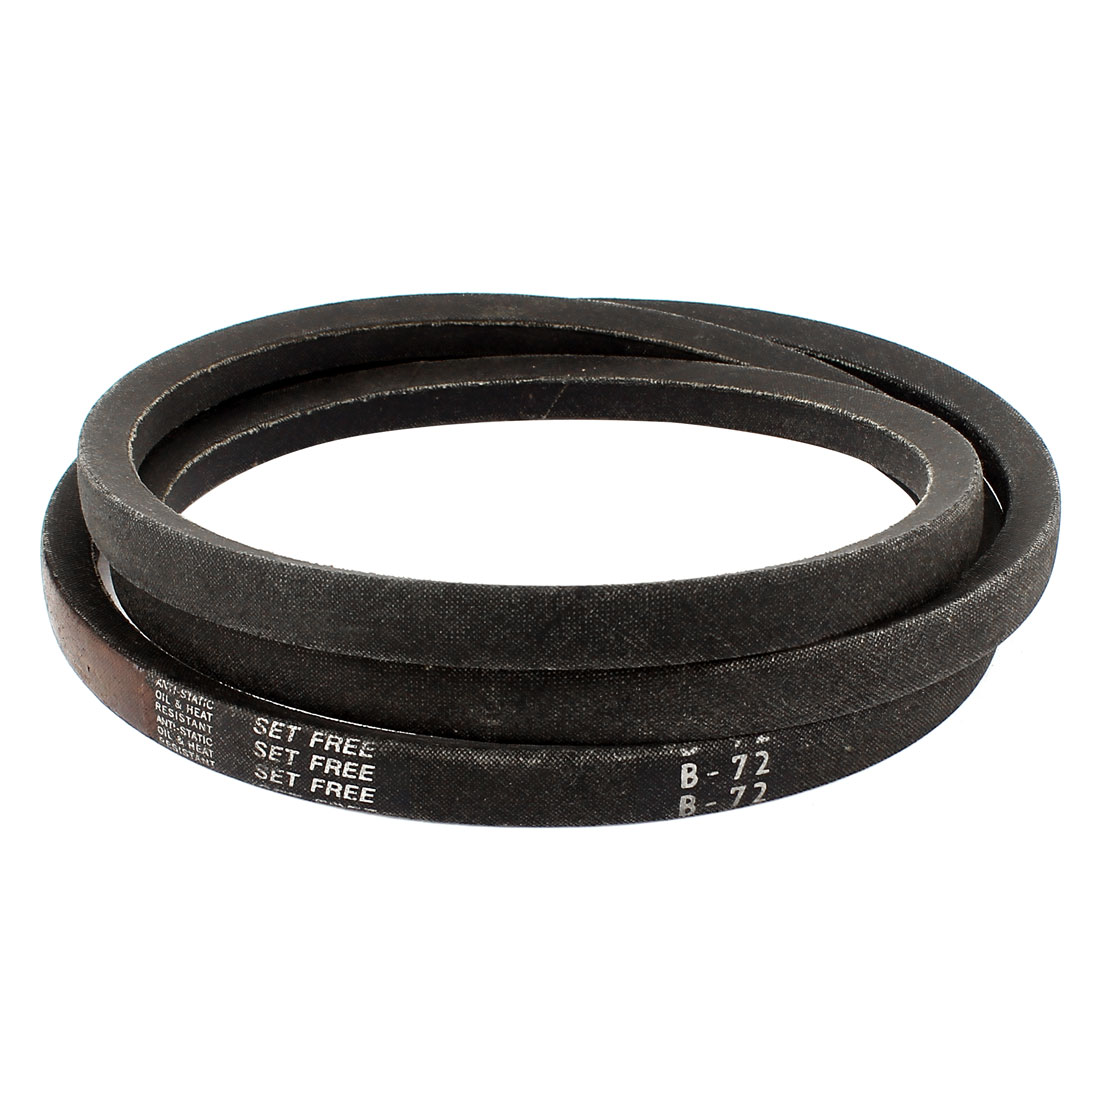 "Industrial Power Drive Rubber V Belt B Type B72 5/8"" x 72"" Black"